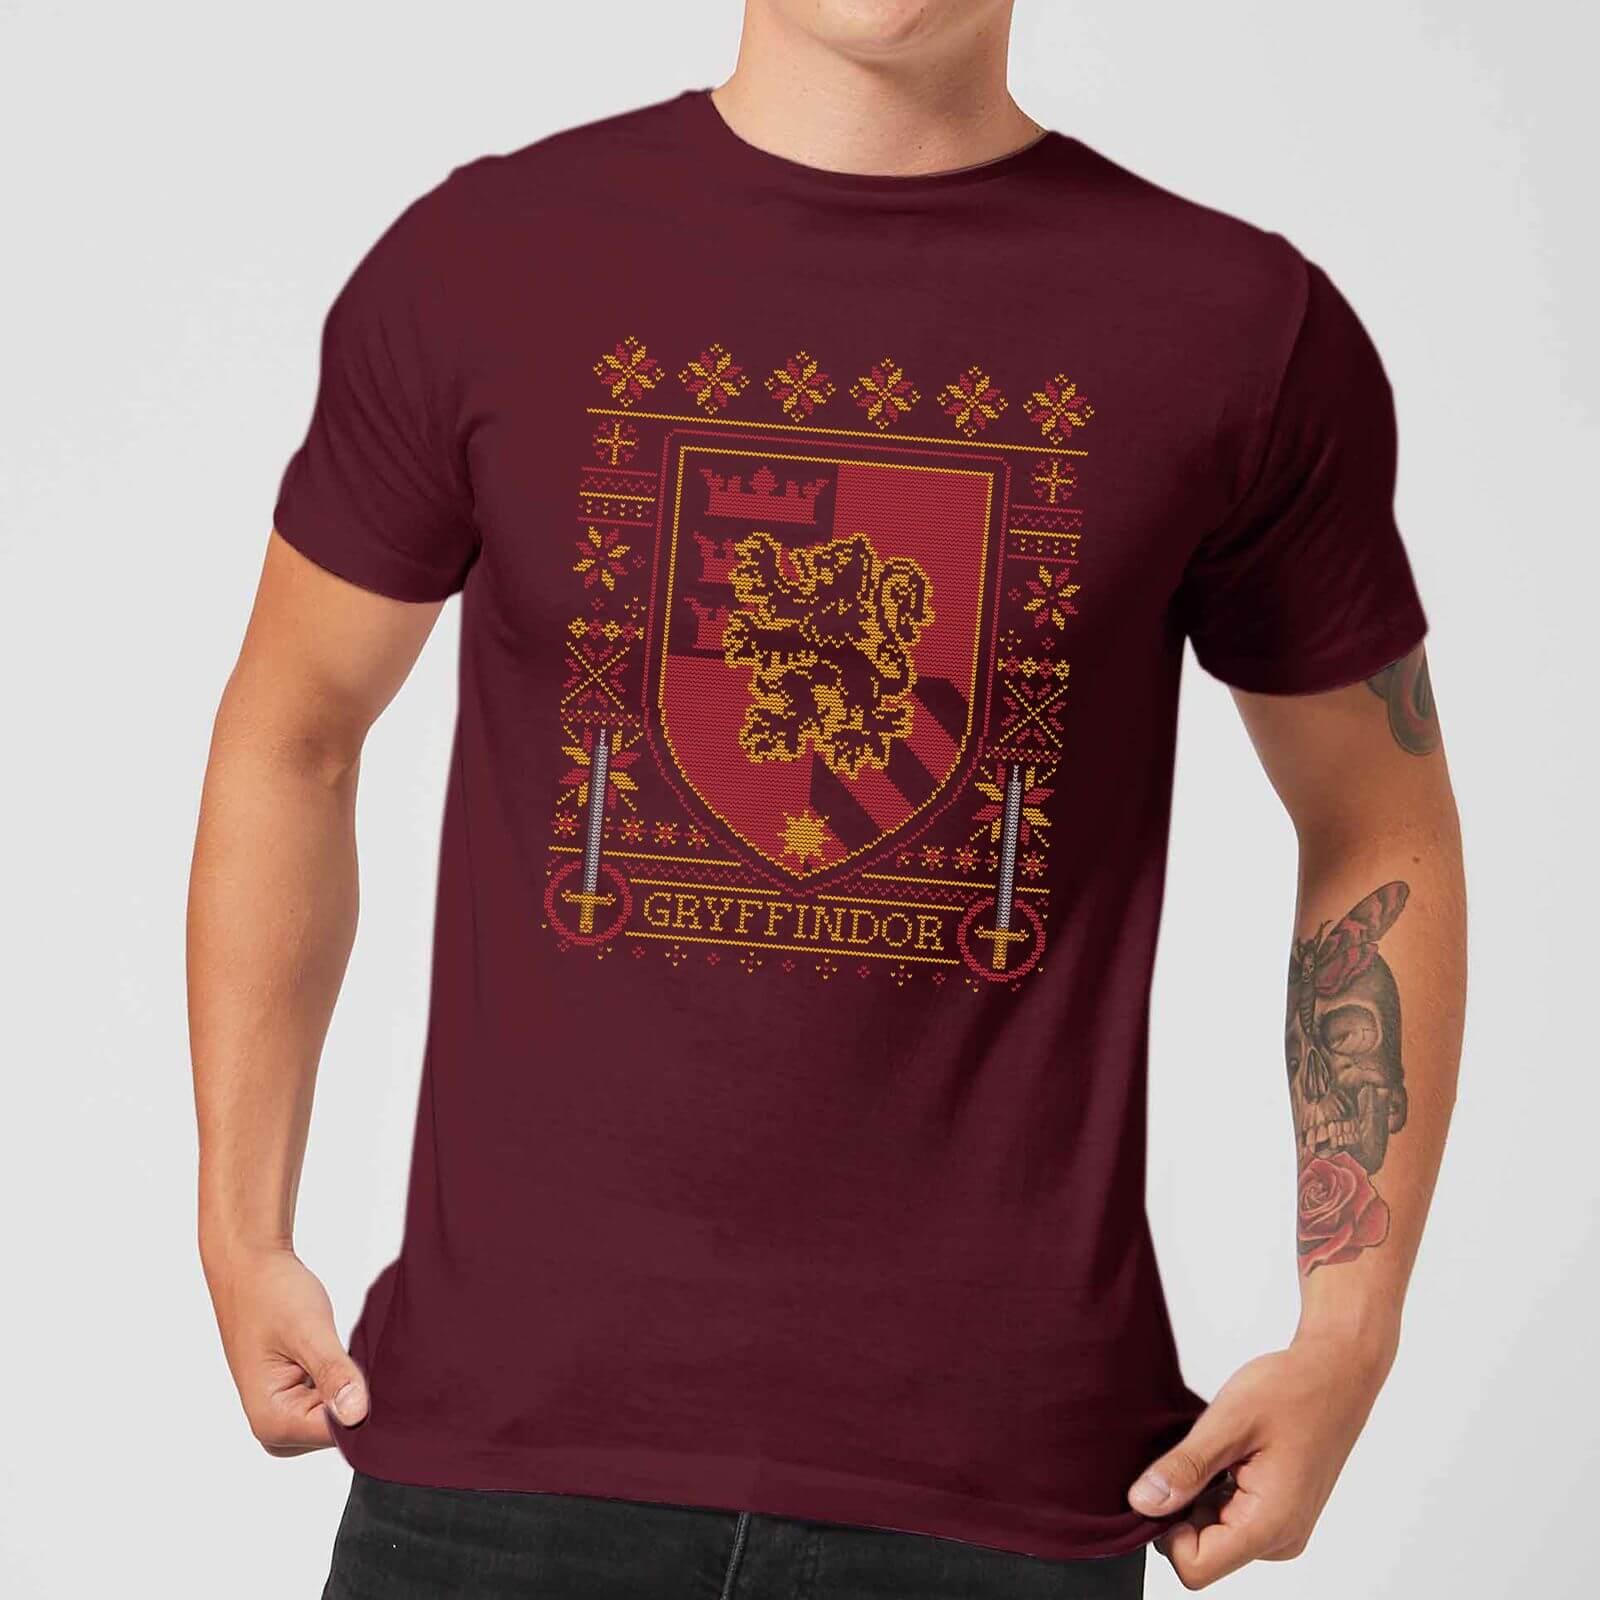 Harry Potter Christmas Shirt.Harry Potter Gryffindor Crest Men S Christmas T Shirt Burgundy